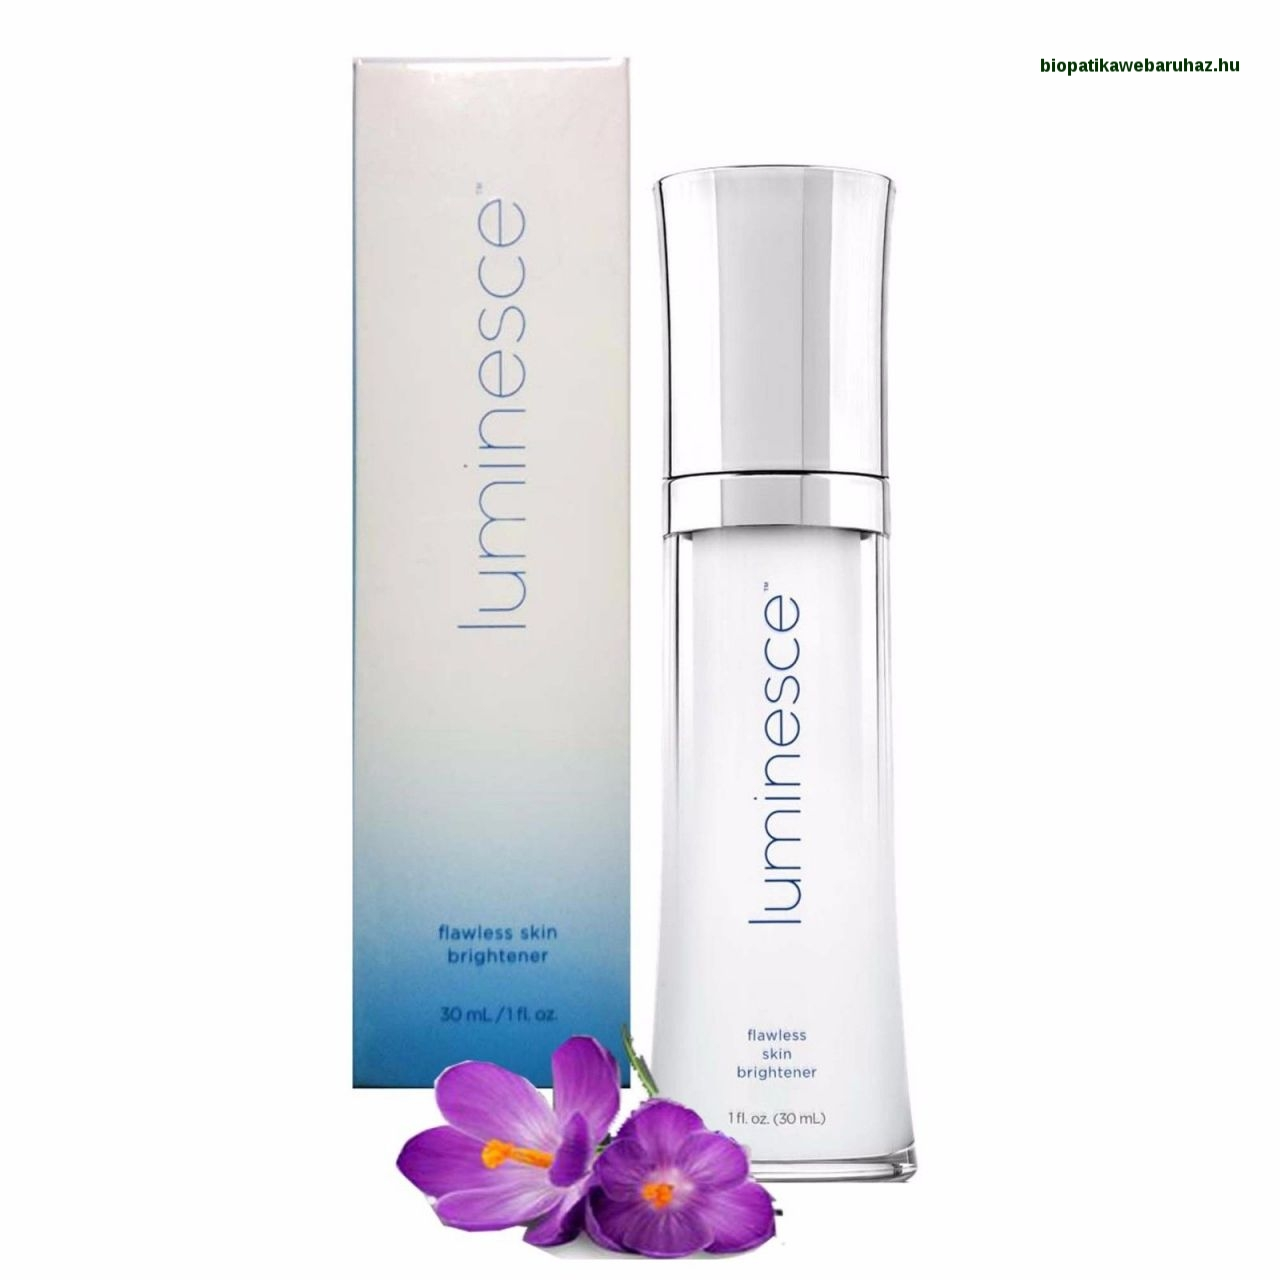 LUMINESCE Flawless Skin Brightener - bőrvilágosító